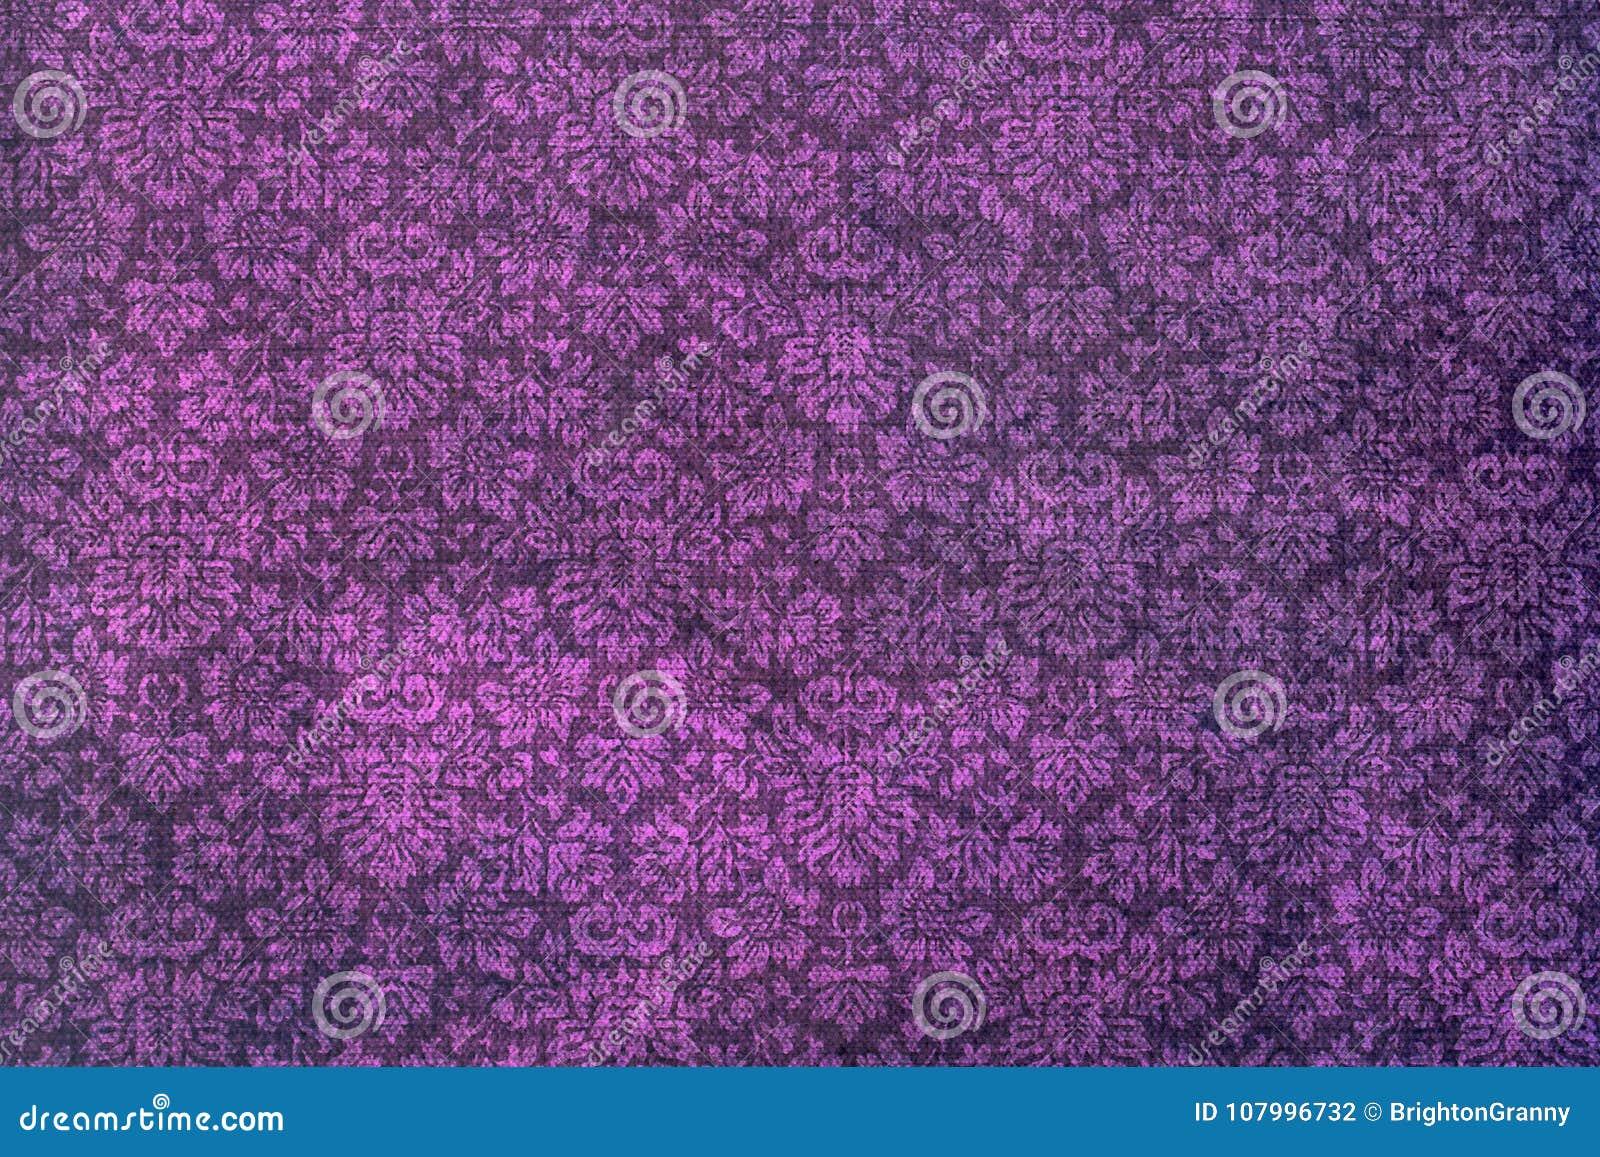 A wallpaper of a repeat botanic pattern.